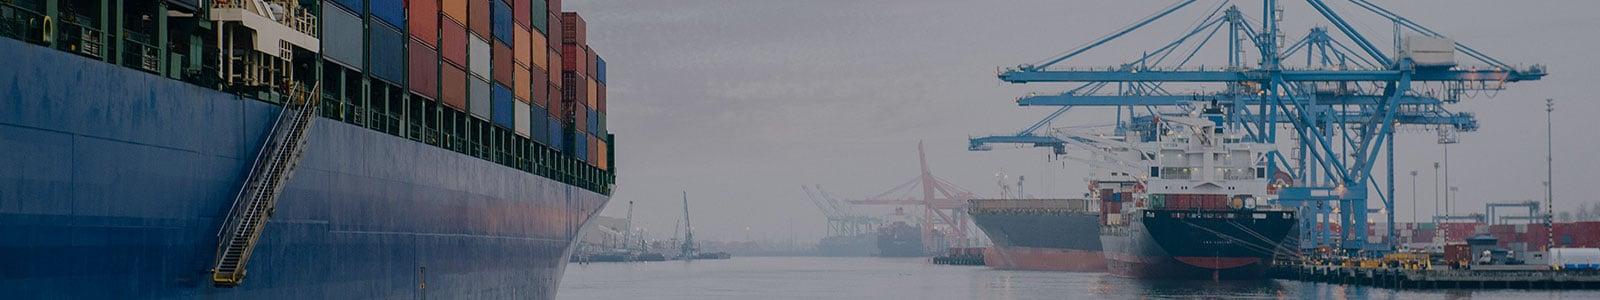 transportation_logistics_banner_300.jpg